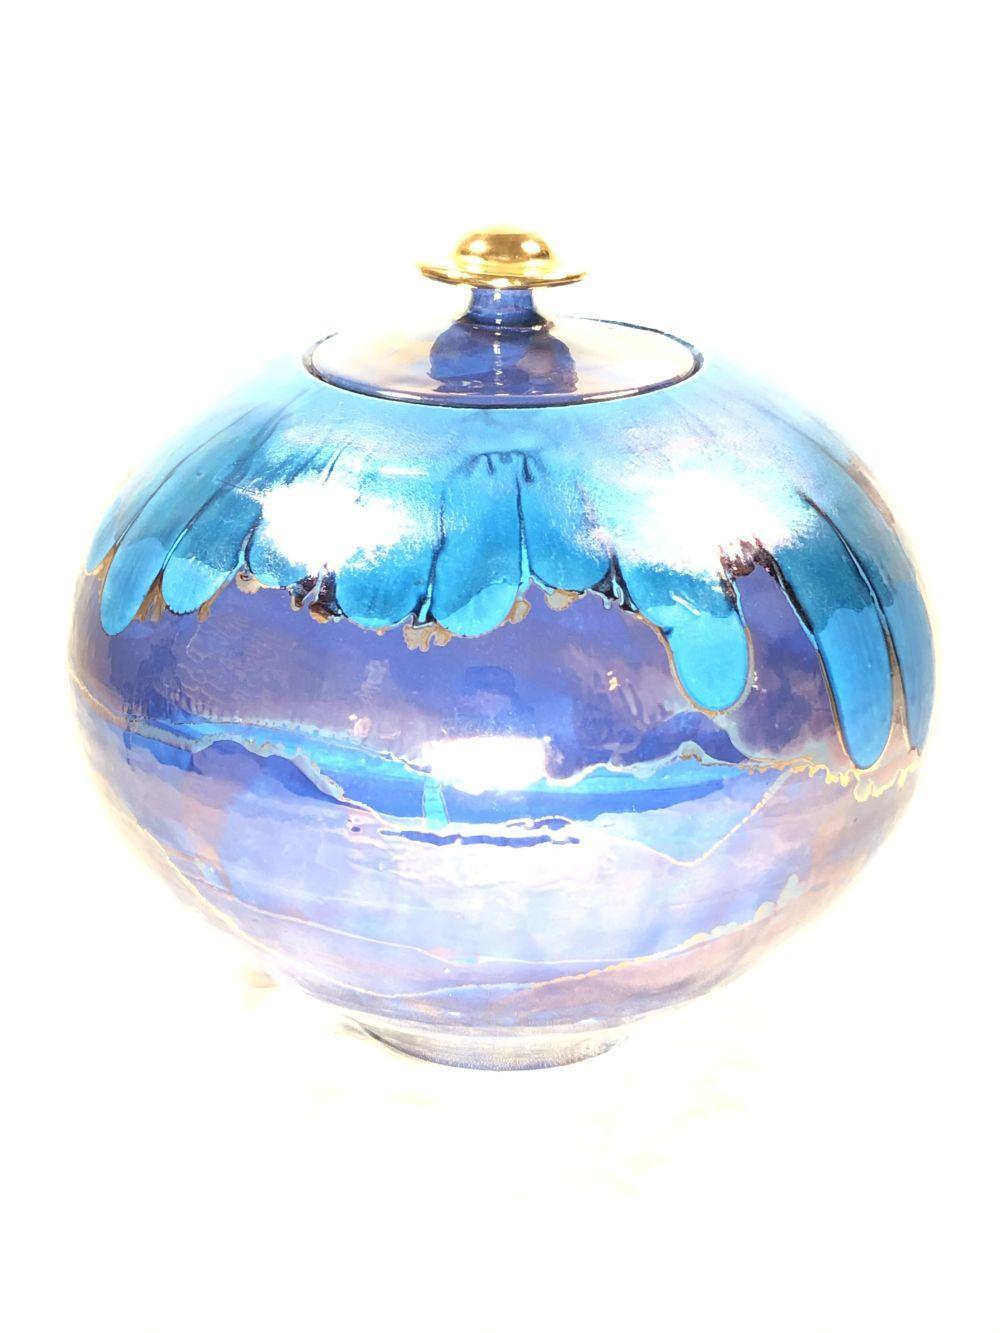 Bruce Fairman Lidded Pottery Luster Glaze